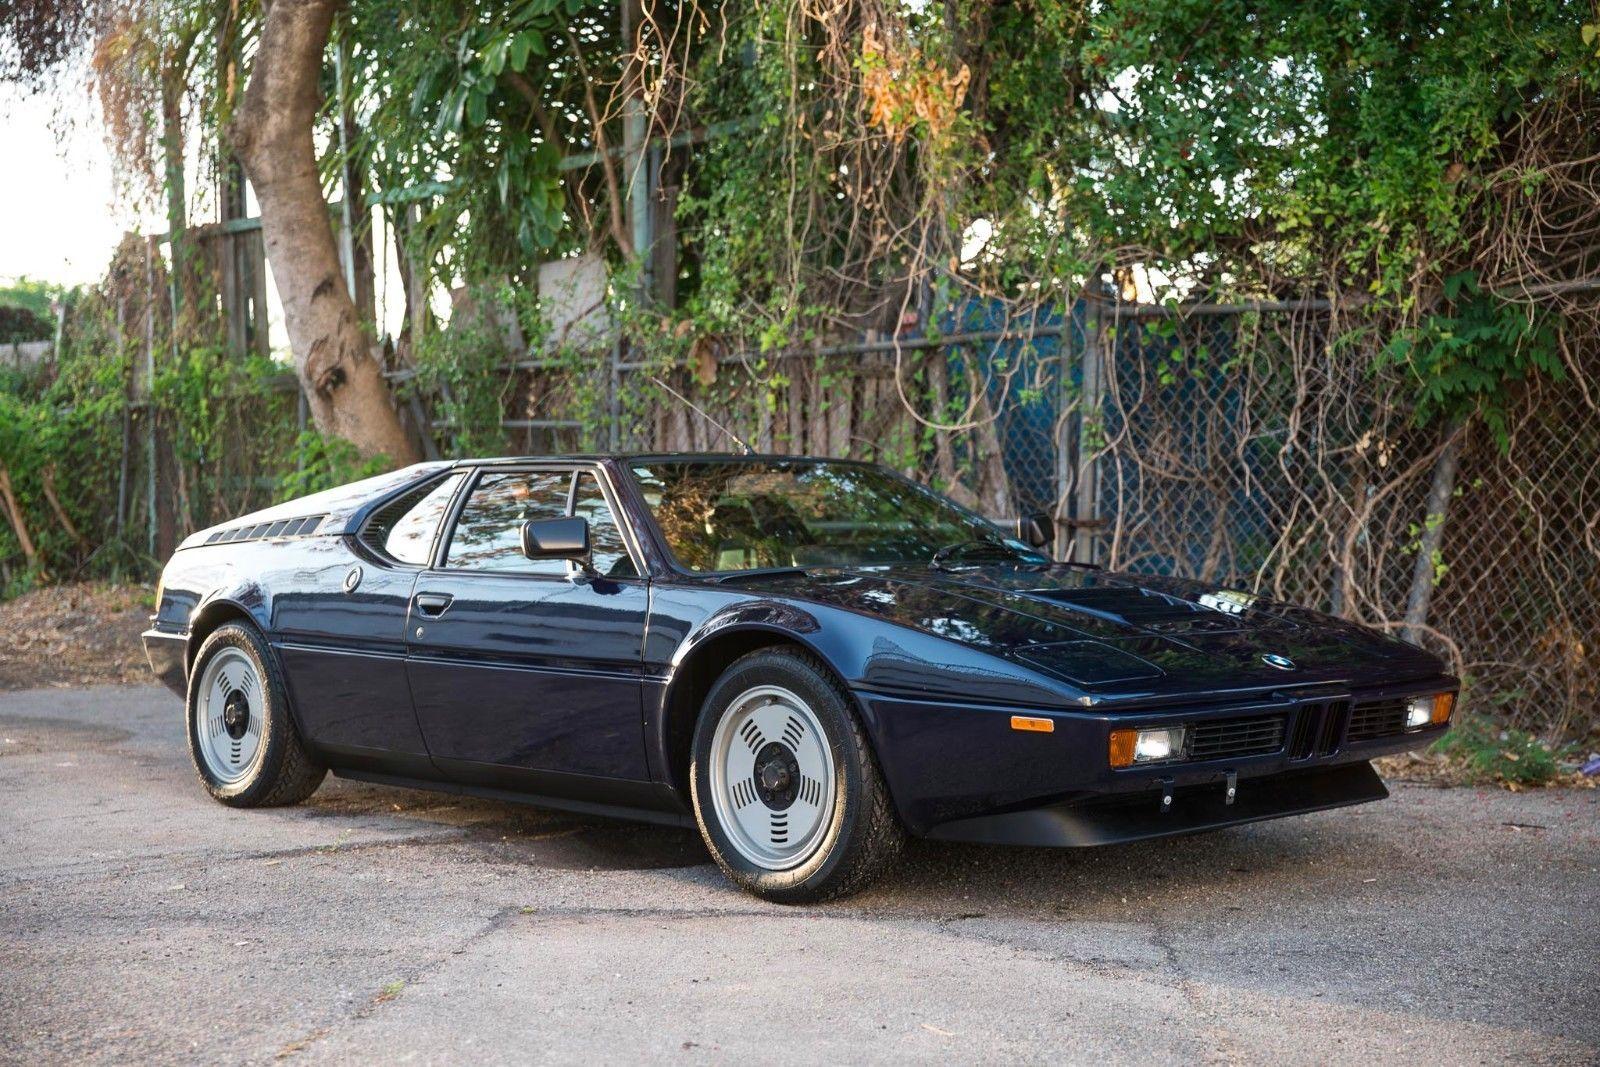 Продава се оригинално BMW M1 (ГАЛЕРИЯ)